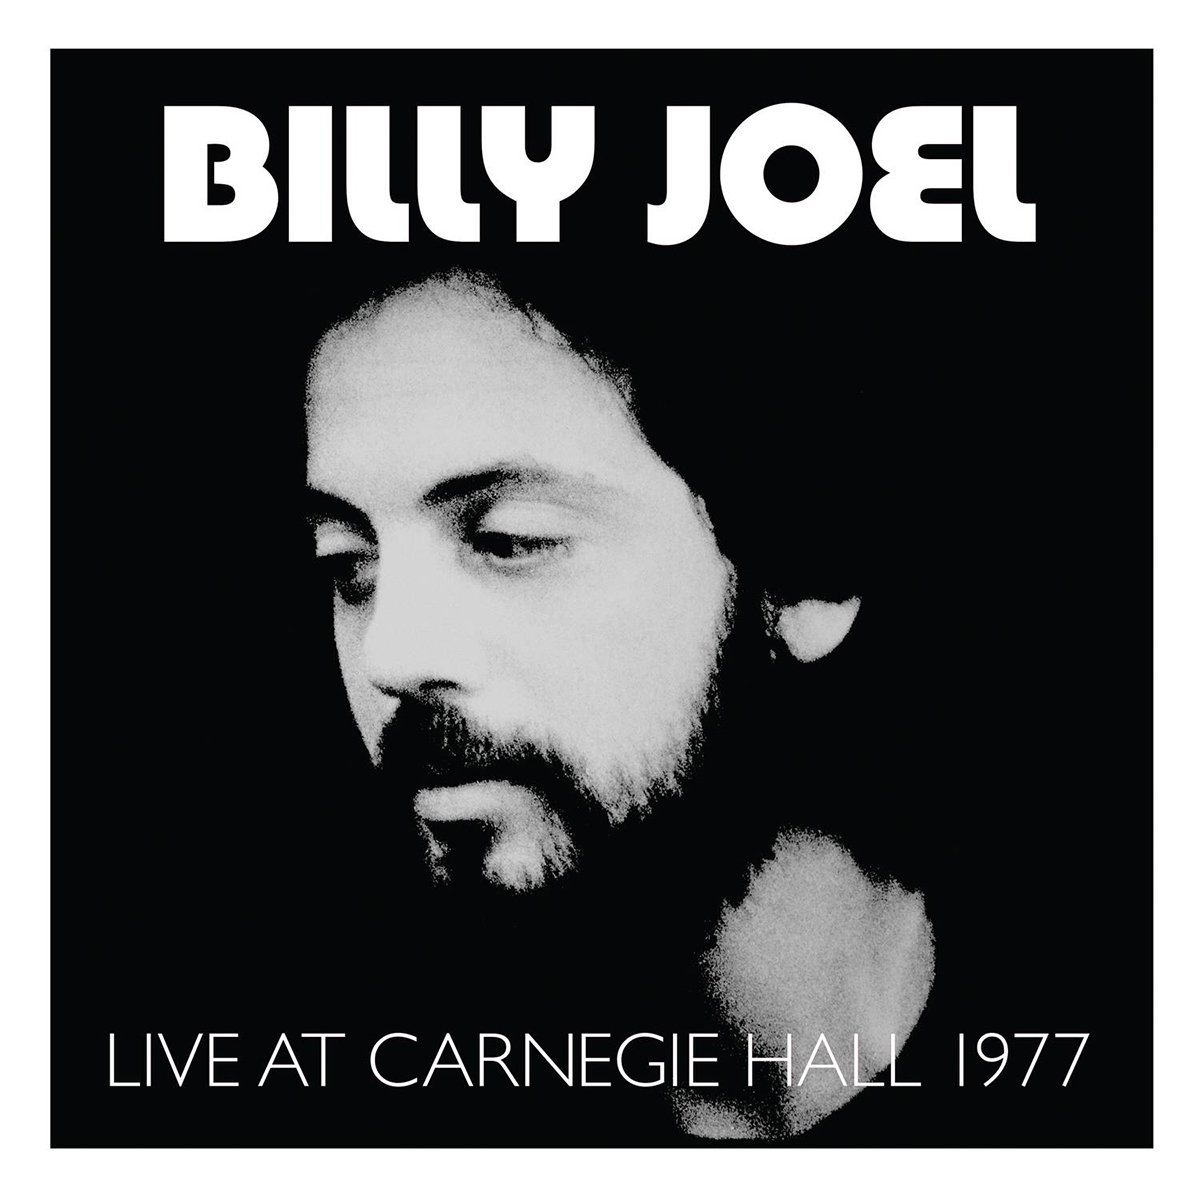 Billy Joel - Live At Carnegie Hall 1977 2LP